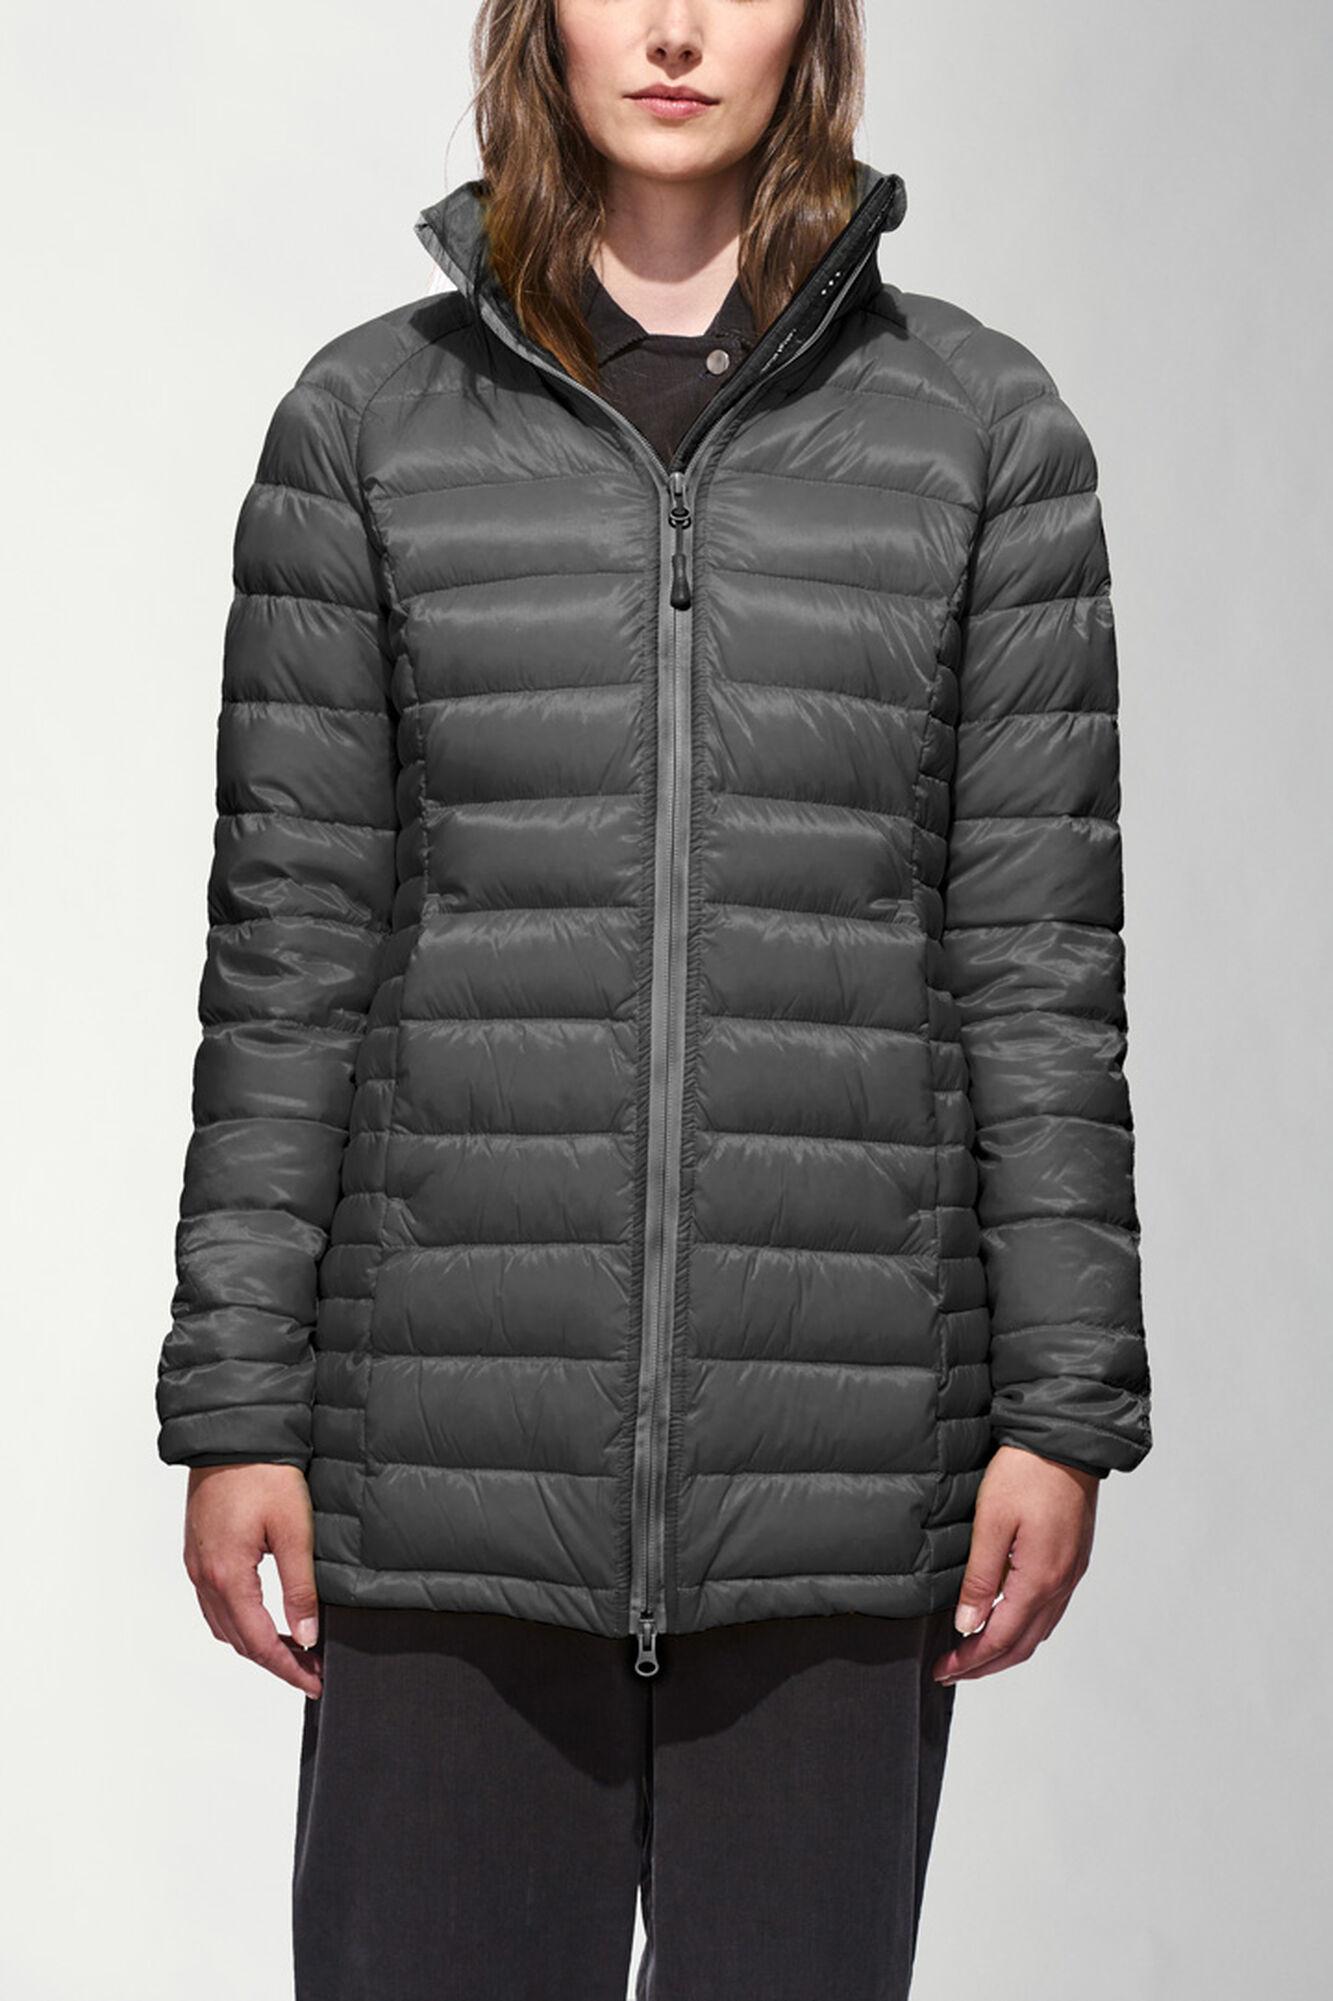 Women's Parkas, Jackets & Accessories   Canada Goose®